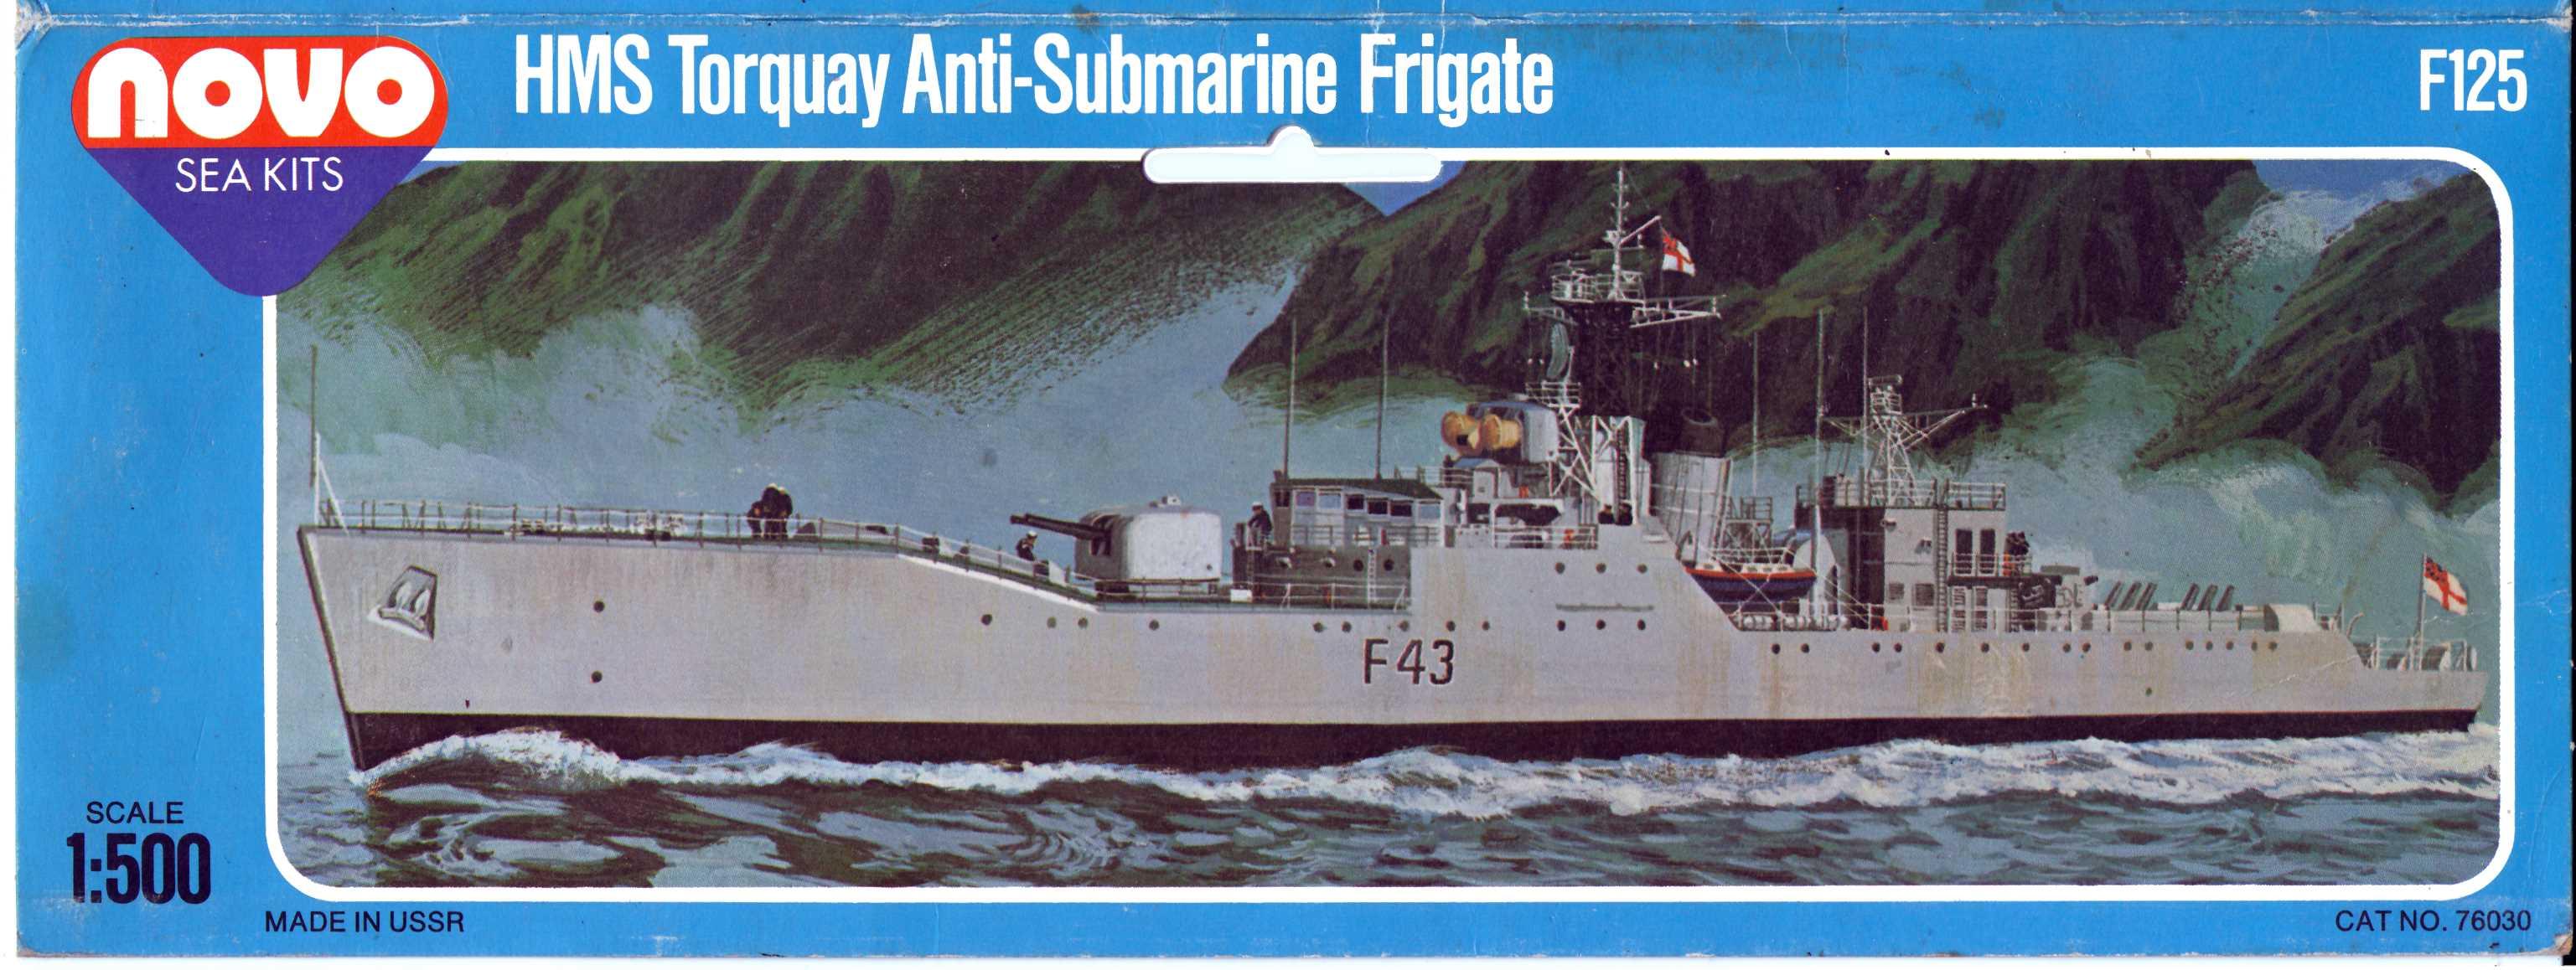 Лепесток NOVO Toys Ltd F125 Cat.No.76030 HMS Torquay Anti-Submarine Frigate